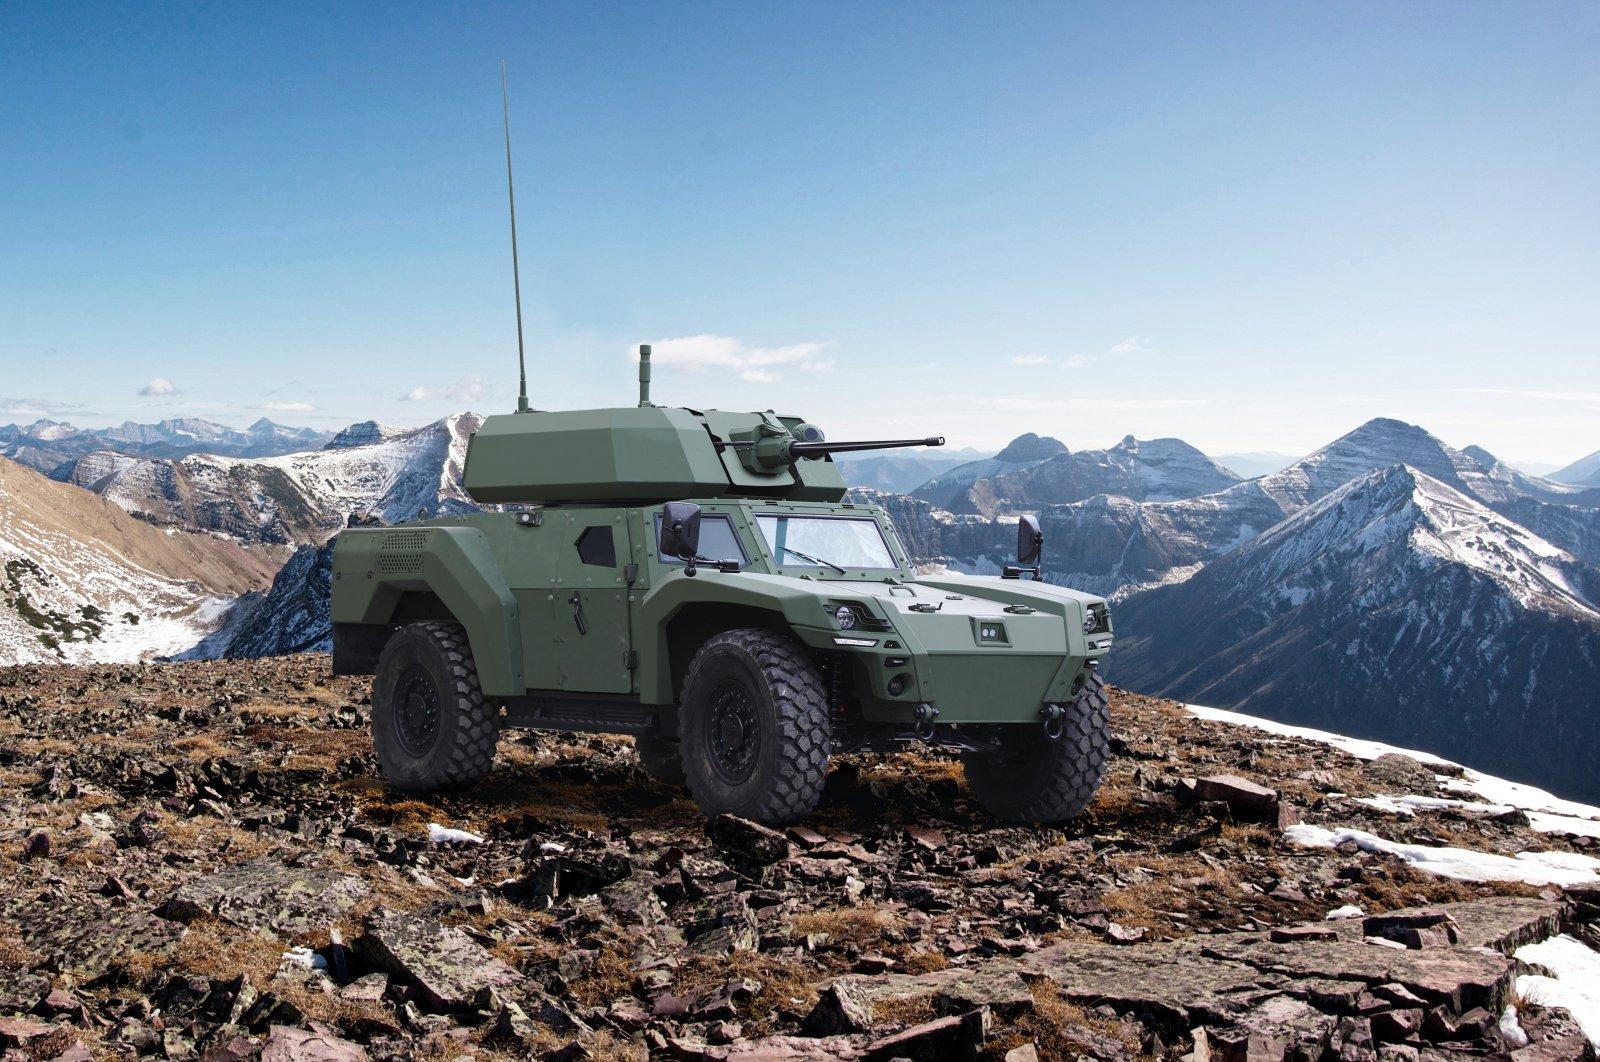 Turkish land vehicle manufacturer Otokar's Akrep II armored vehicle seen in this photo provided on April 15, 2021. (Courtesy of Otokar)